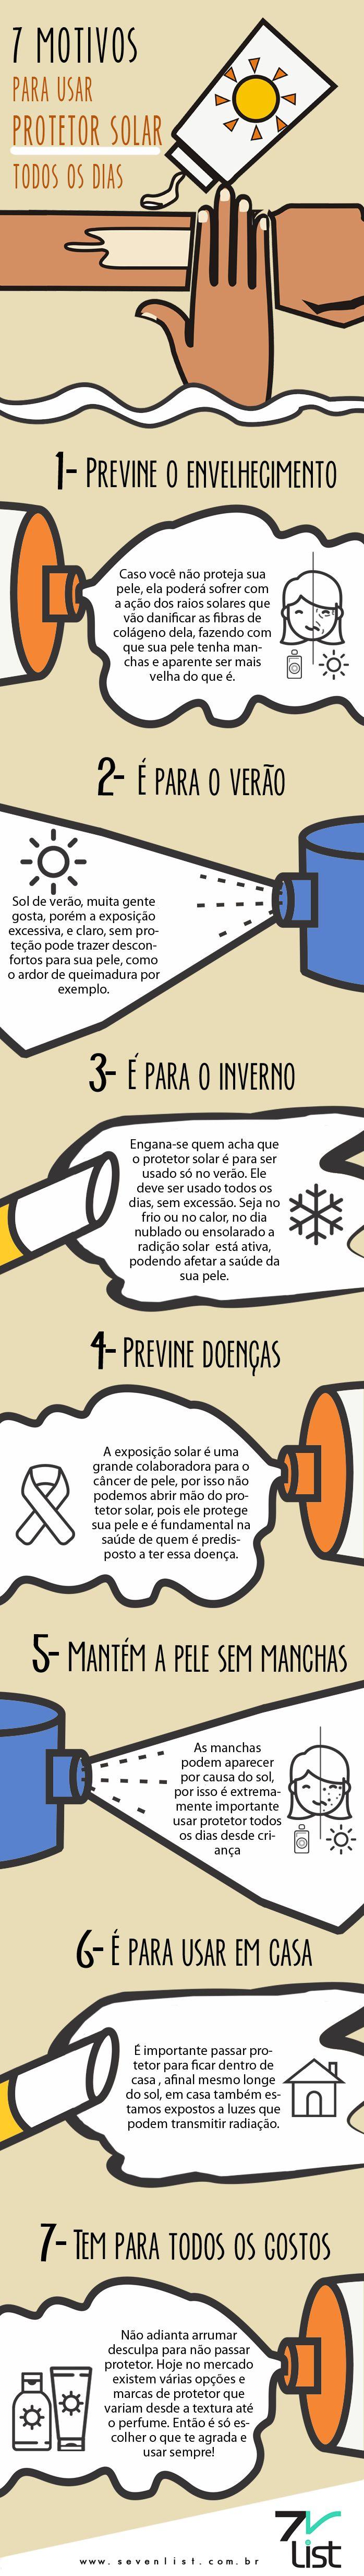 #Infográfico #Infographic #List #Lista #Sevenlist #Pele #Saúde #Bemestar #Sol…